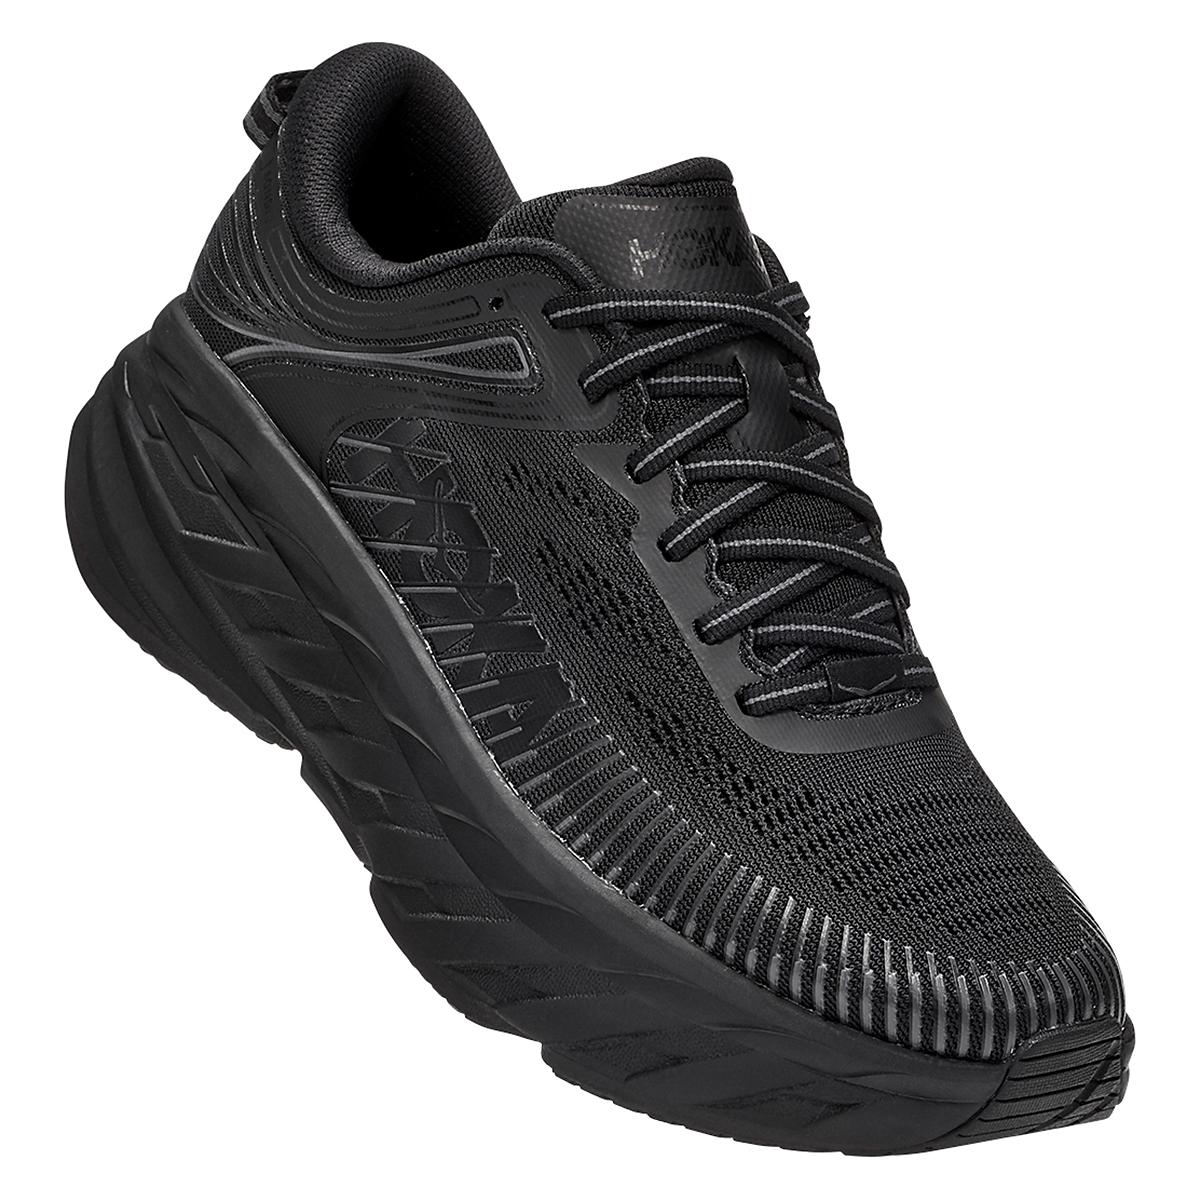 Women's Hoka One One Bondi 7 Running Shoe - Color: Black - Size: 5 - Width: Regular, Black, large, image 2